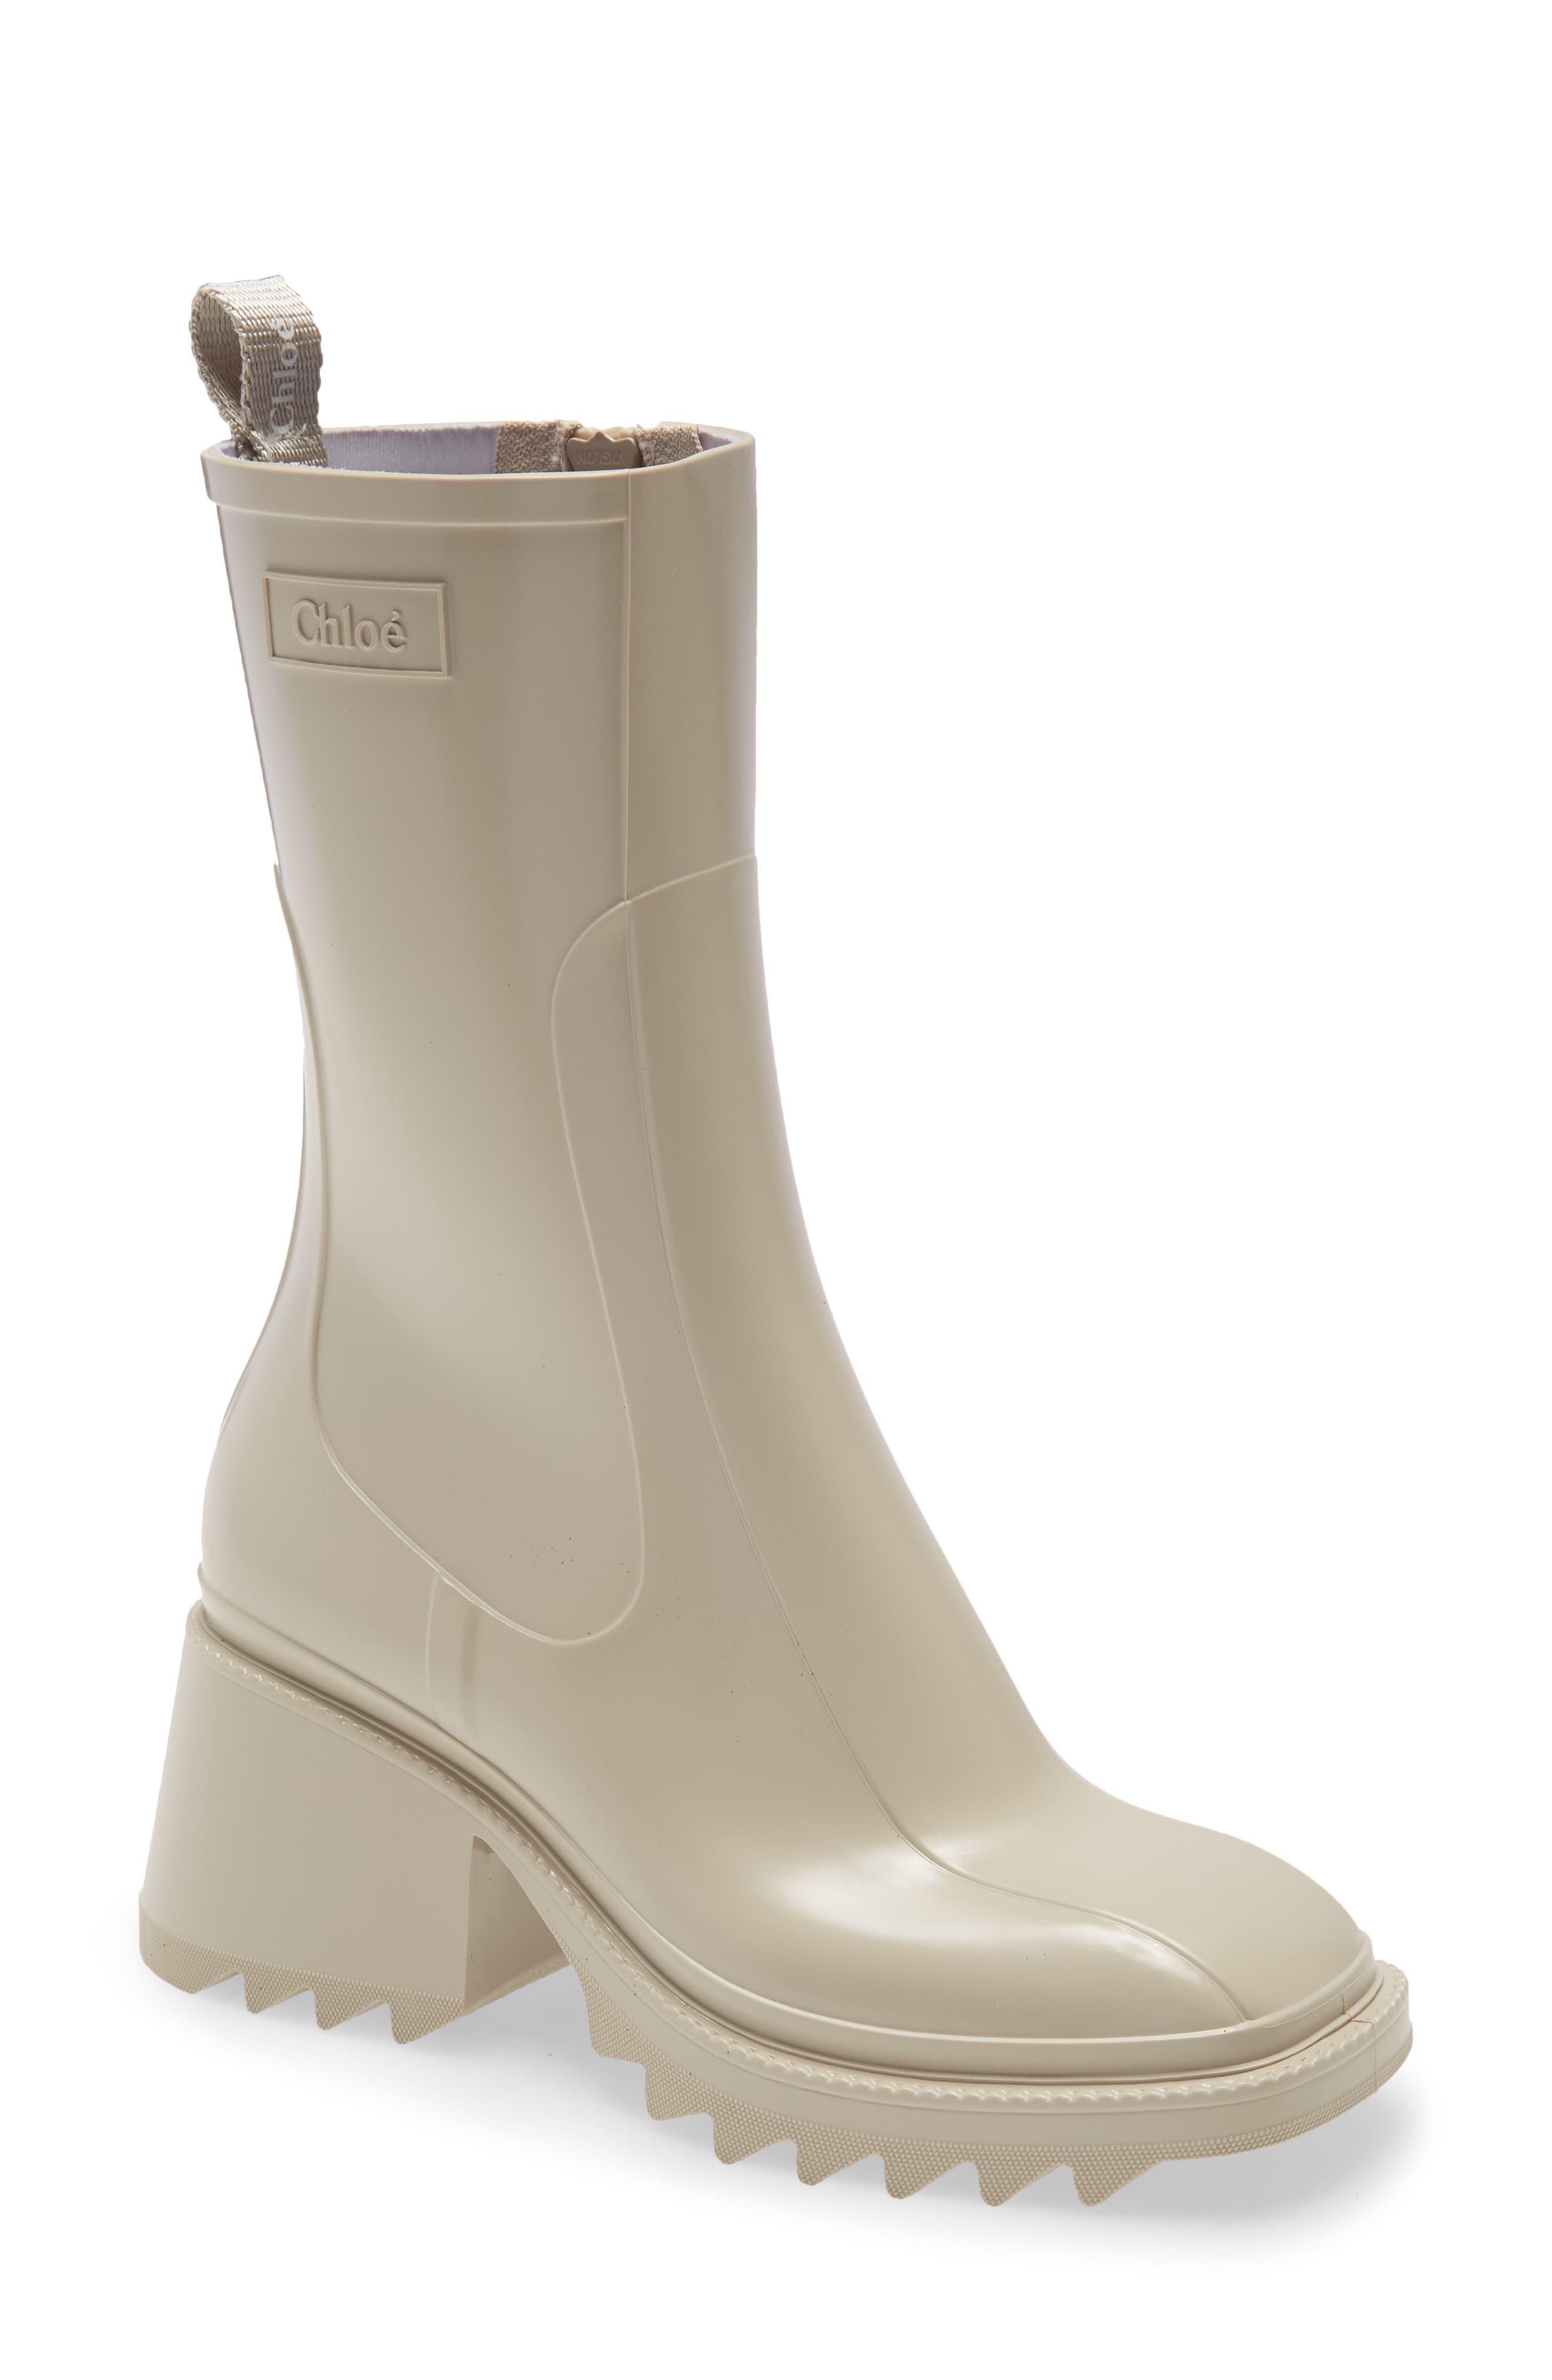 Women's Chloé Shoes | Nordstrom